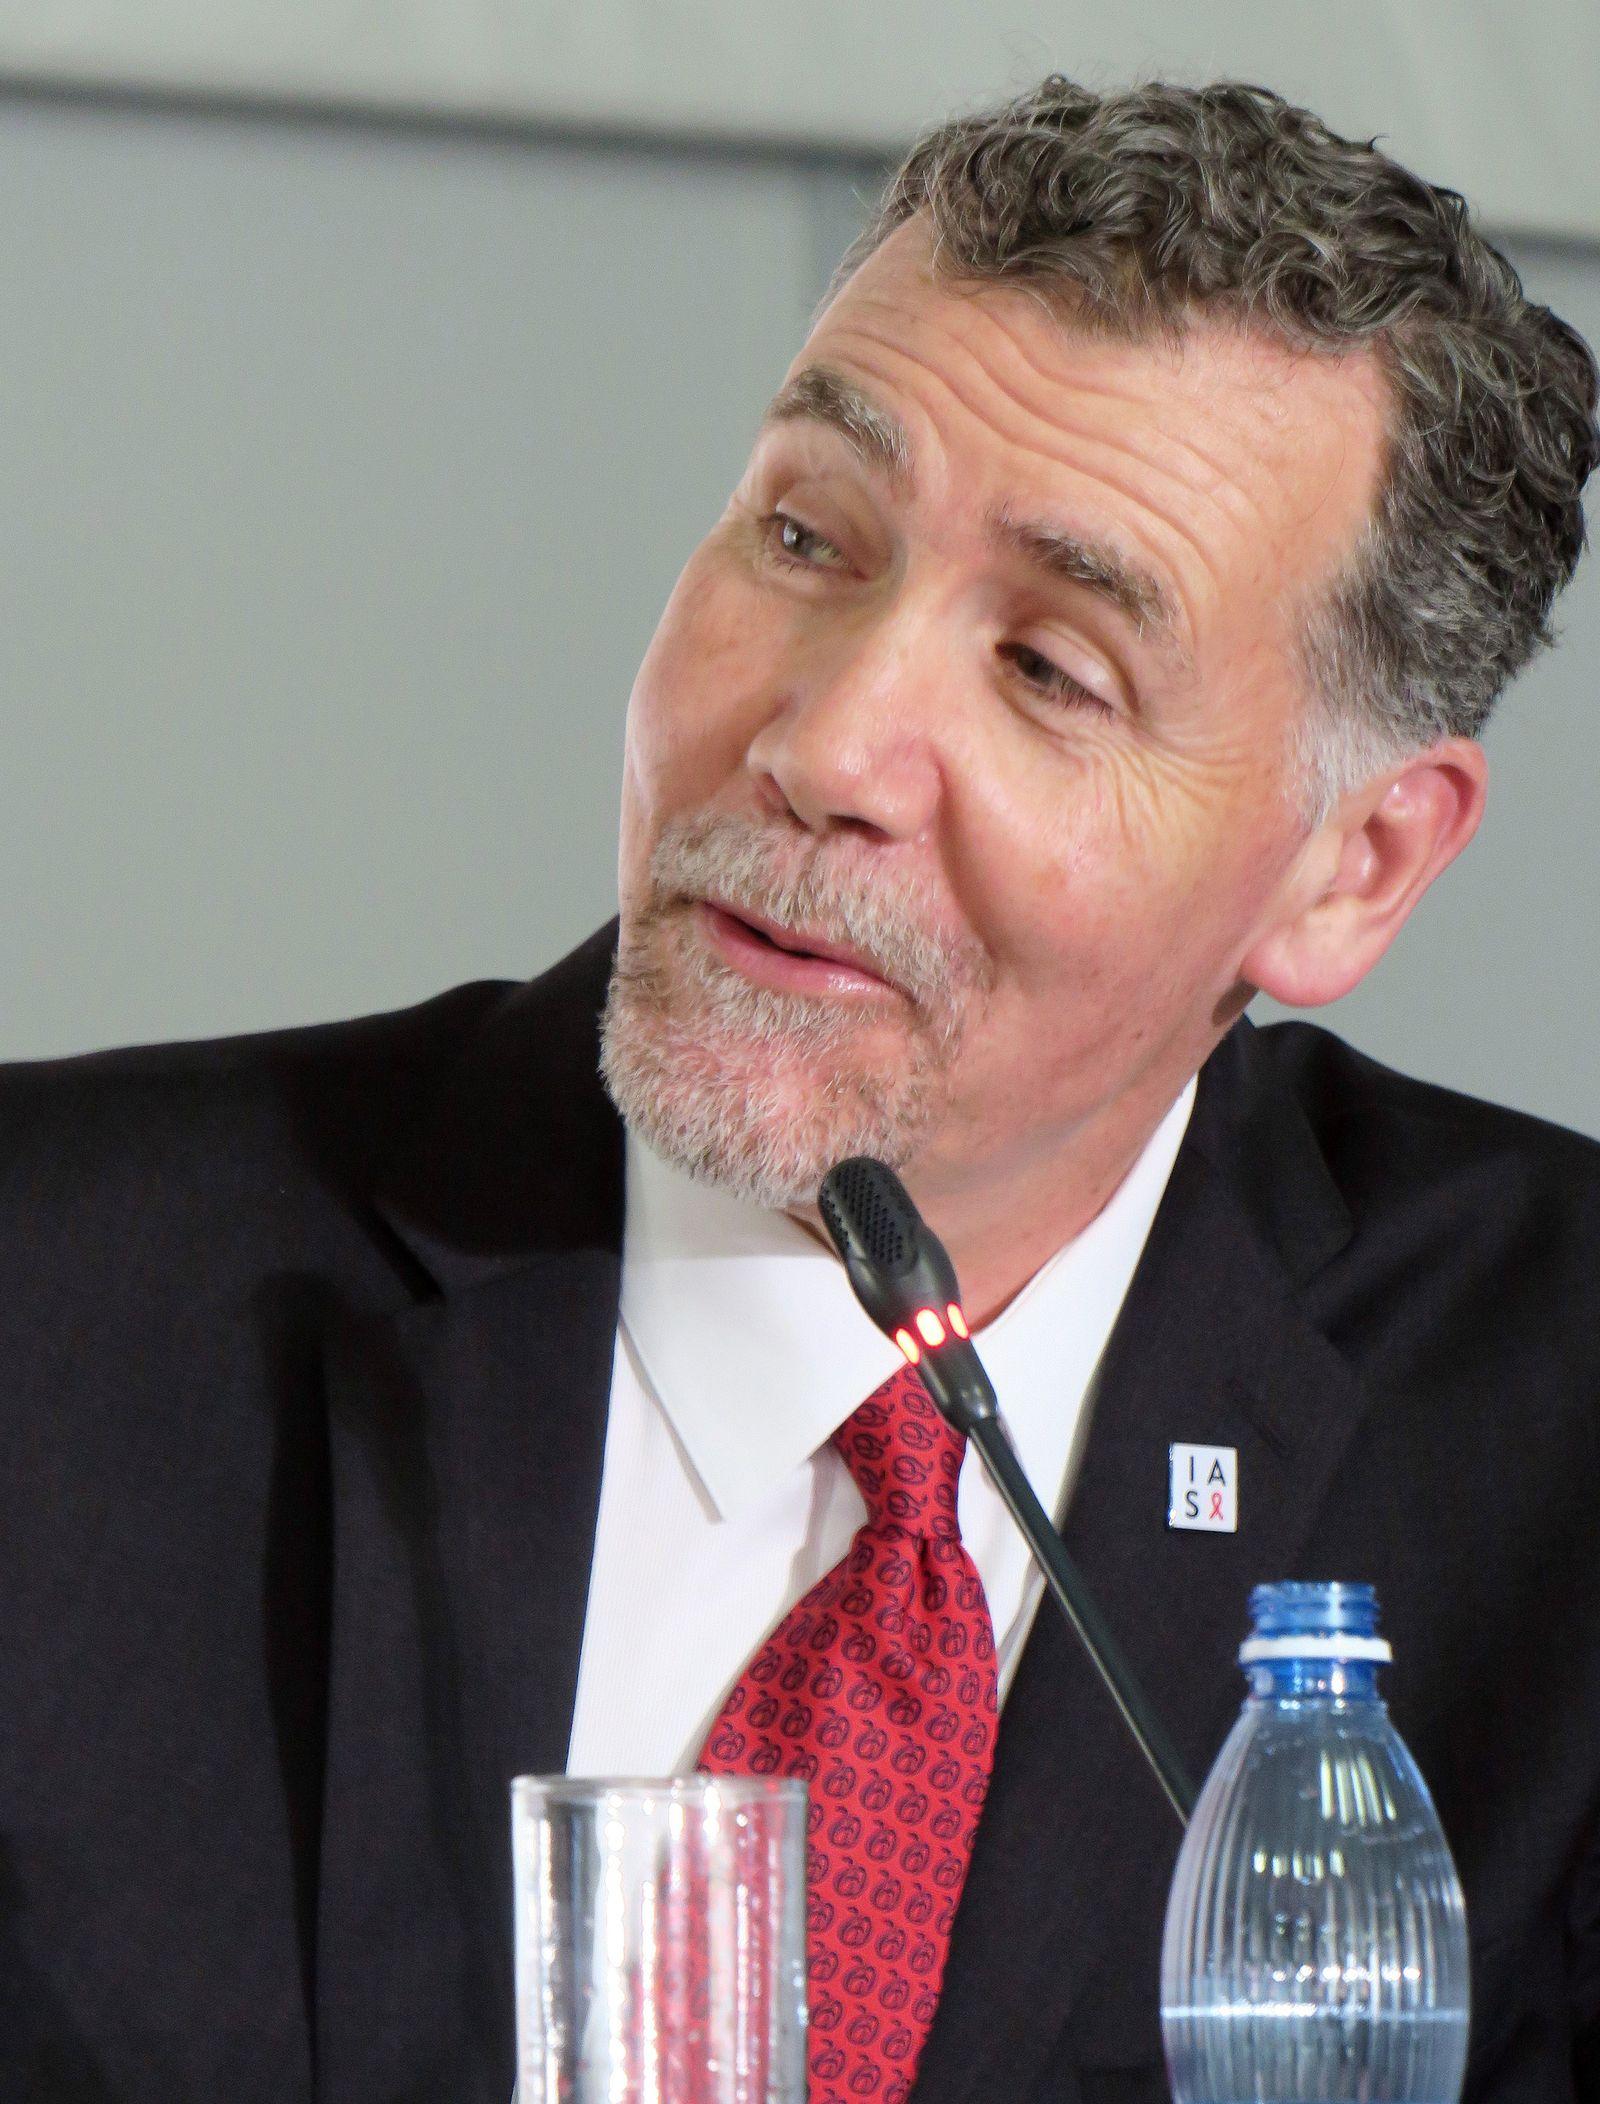 Chris Beyrer/ Welt-Aids-Konferenz